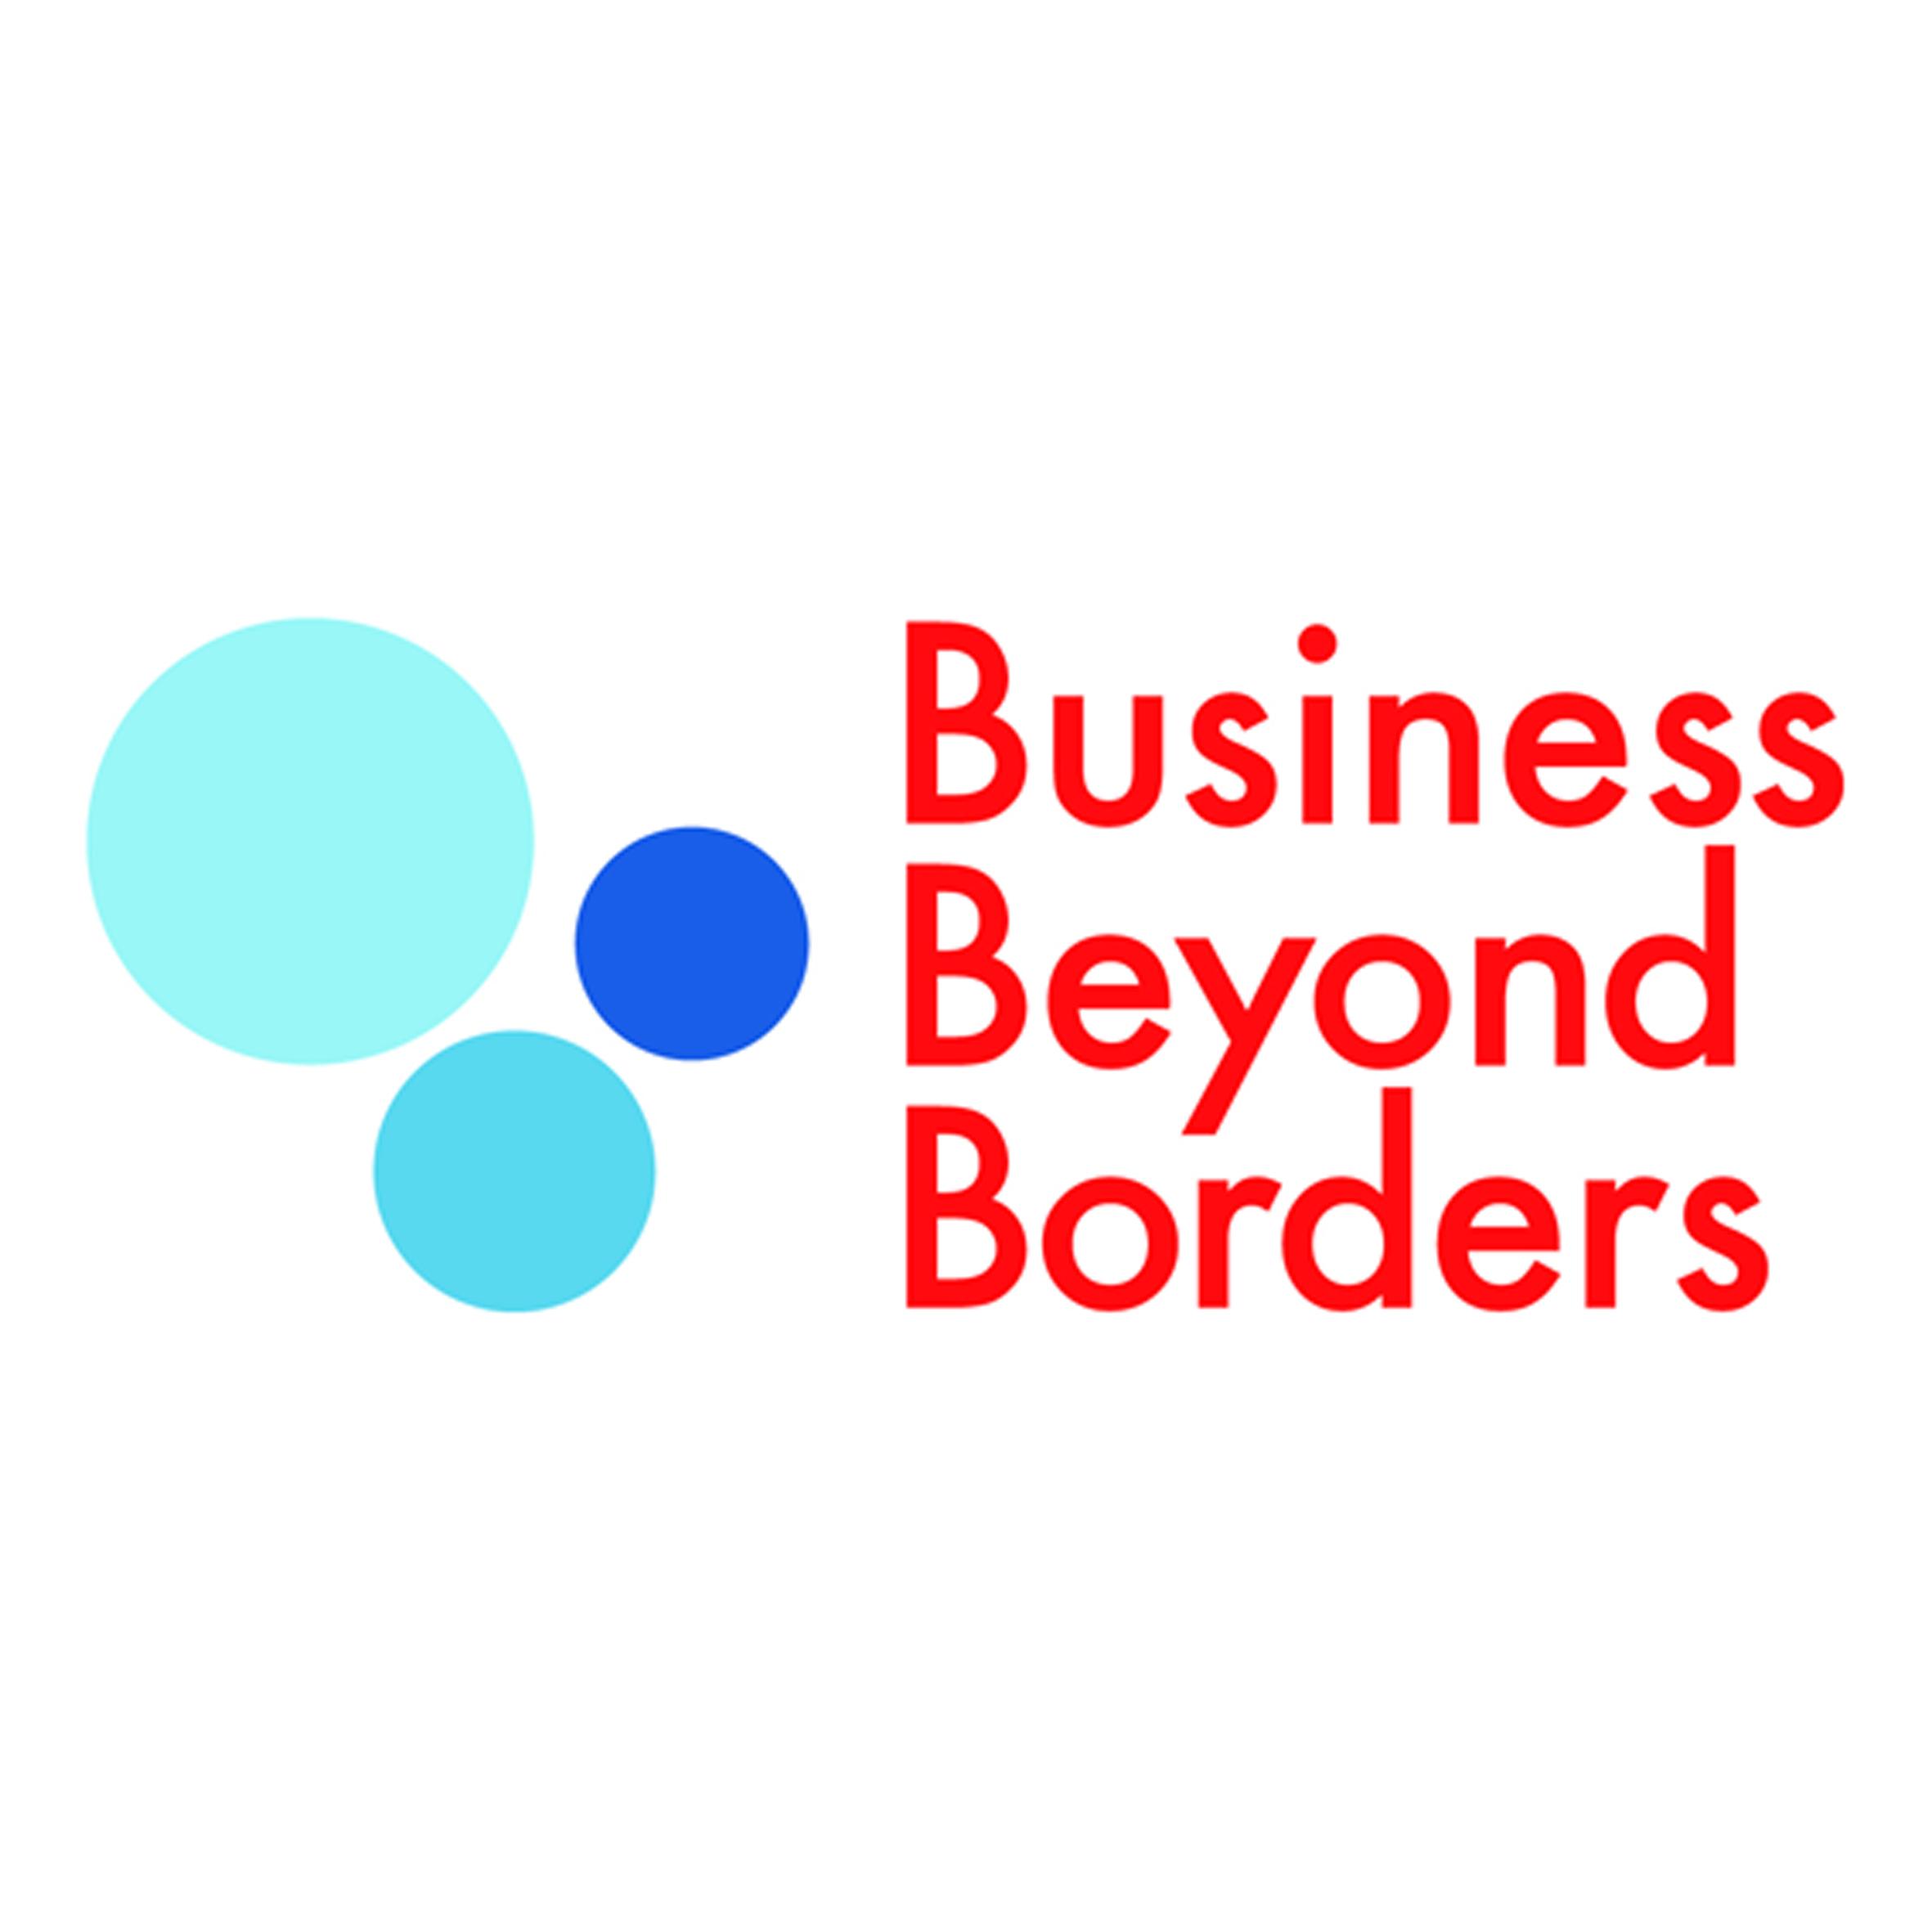 Business Beyond Borders